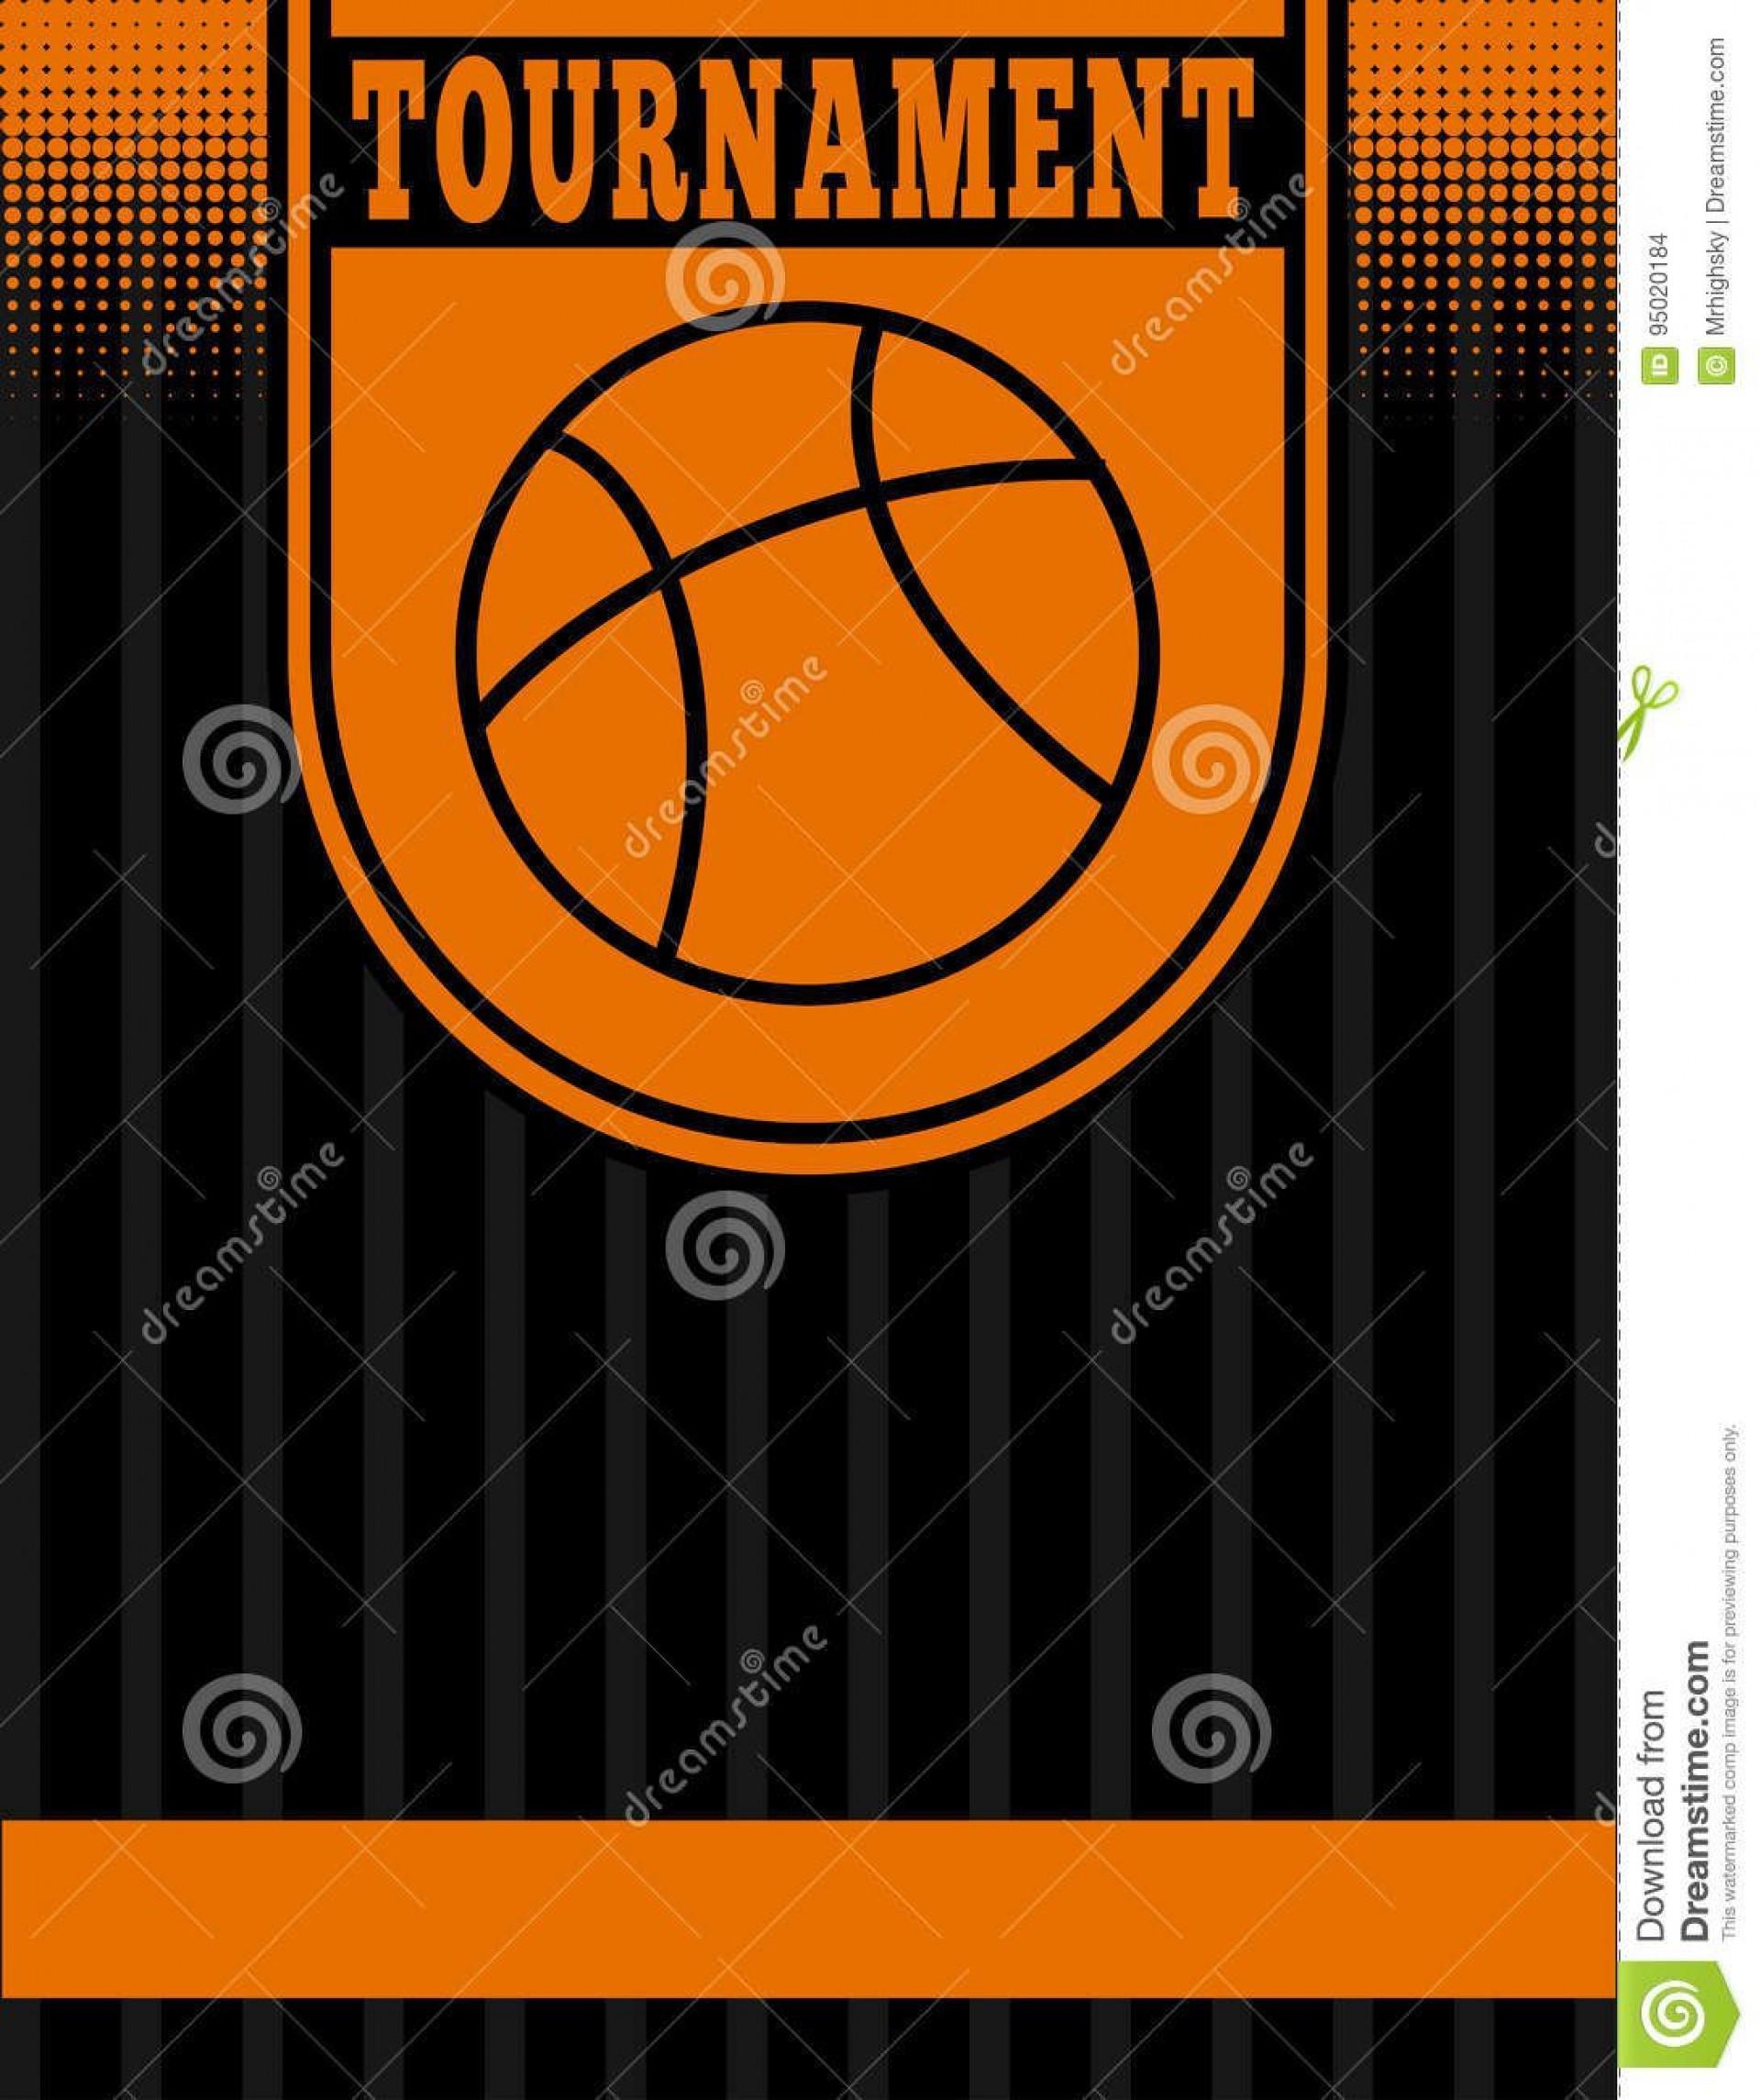 005 Singular Basketball Tournament Flyer Template Idea  3 On Free1920